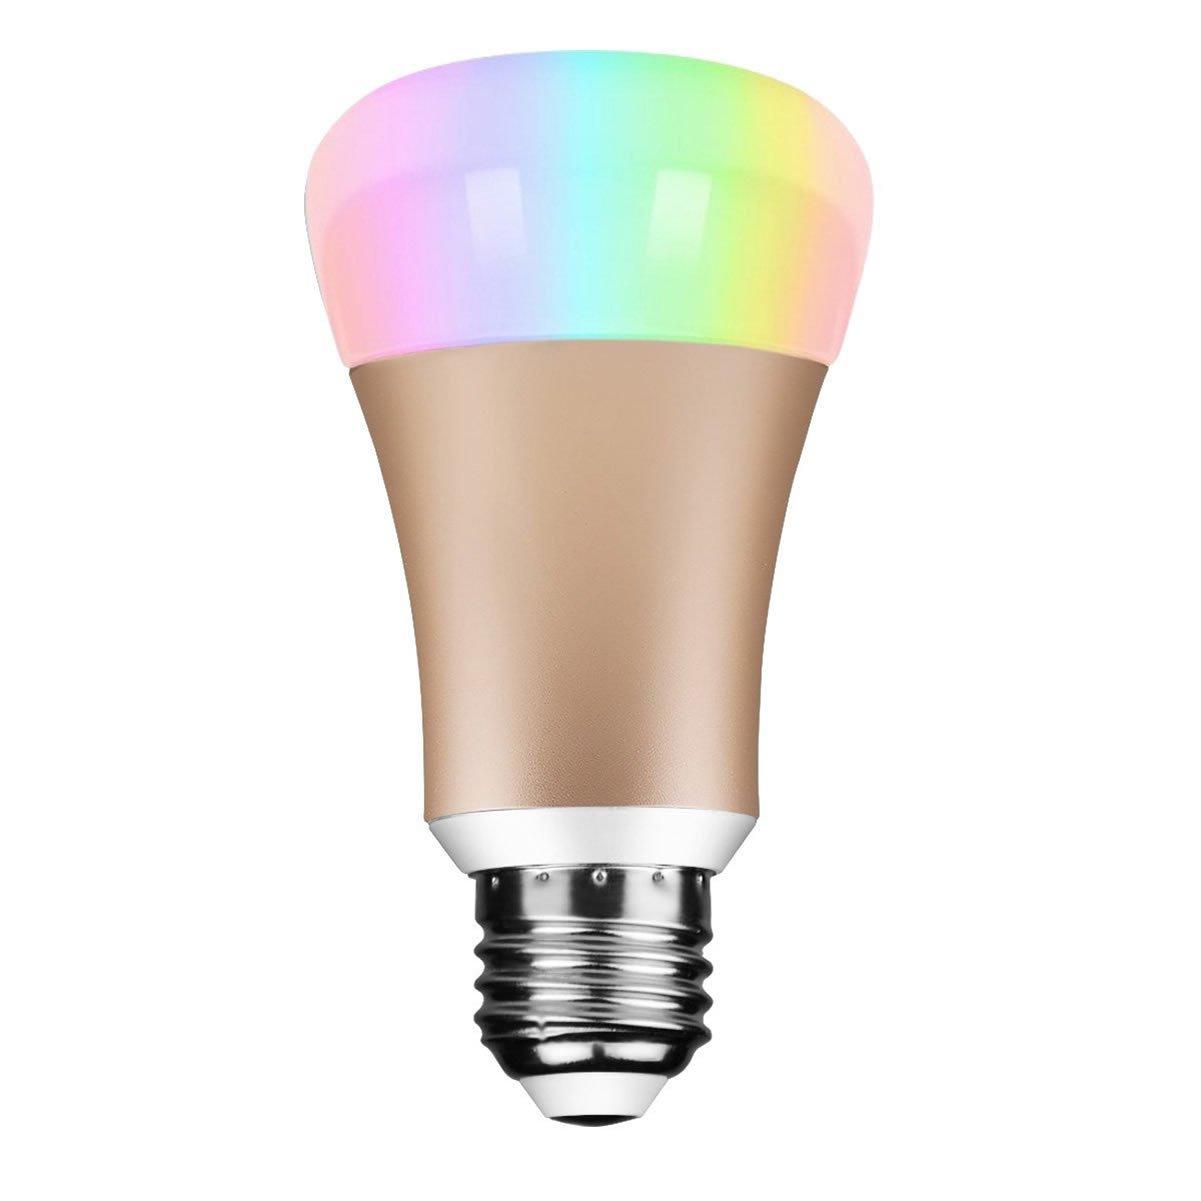 Smart Wifi LED Light Bulb - iGreely Smart RGB Bulb Dimmable